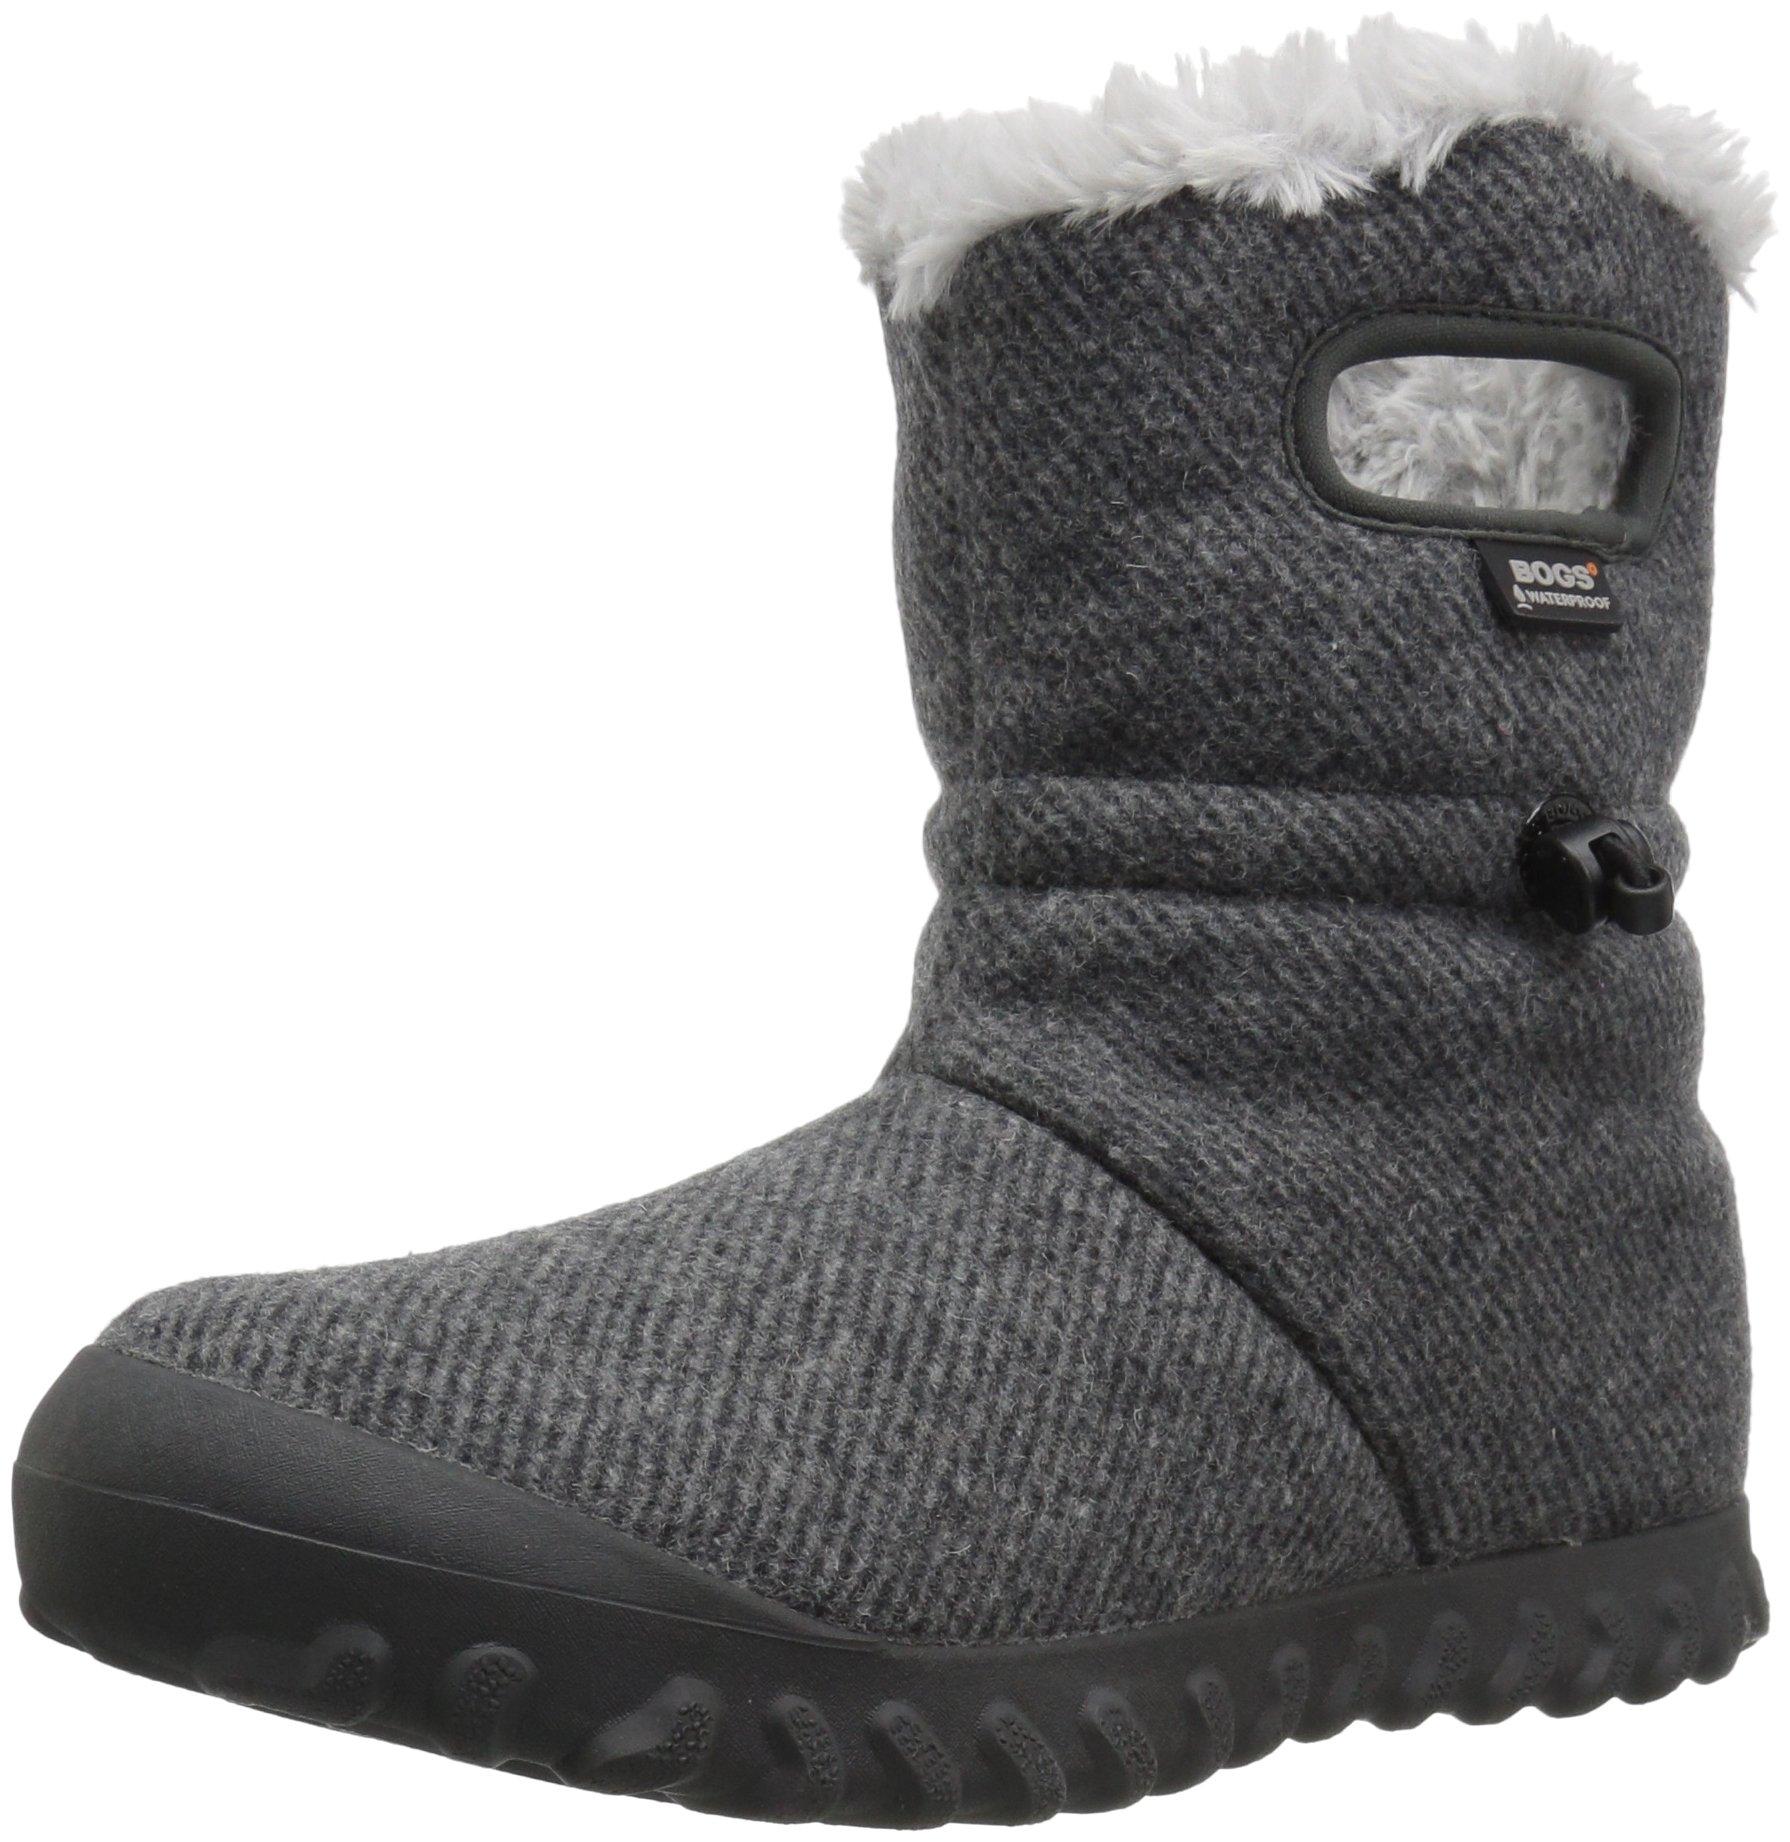 Bogs Women's Bmoc Wool Snow Boot, Charcoal, 7 M US